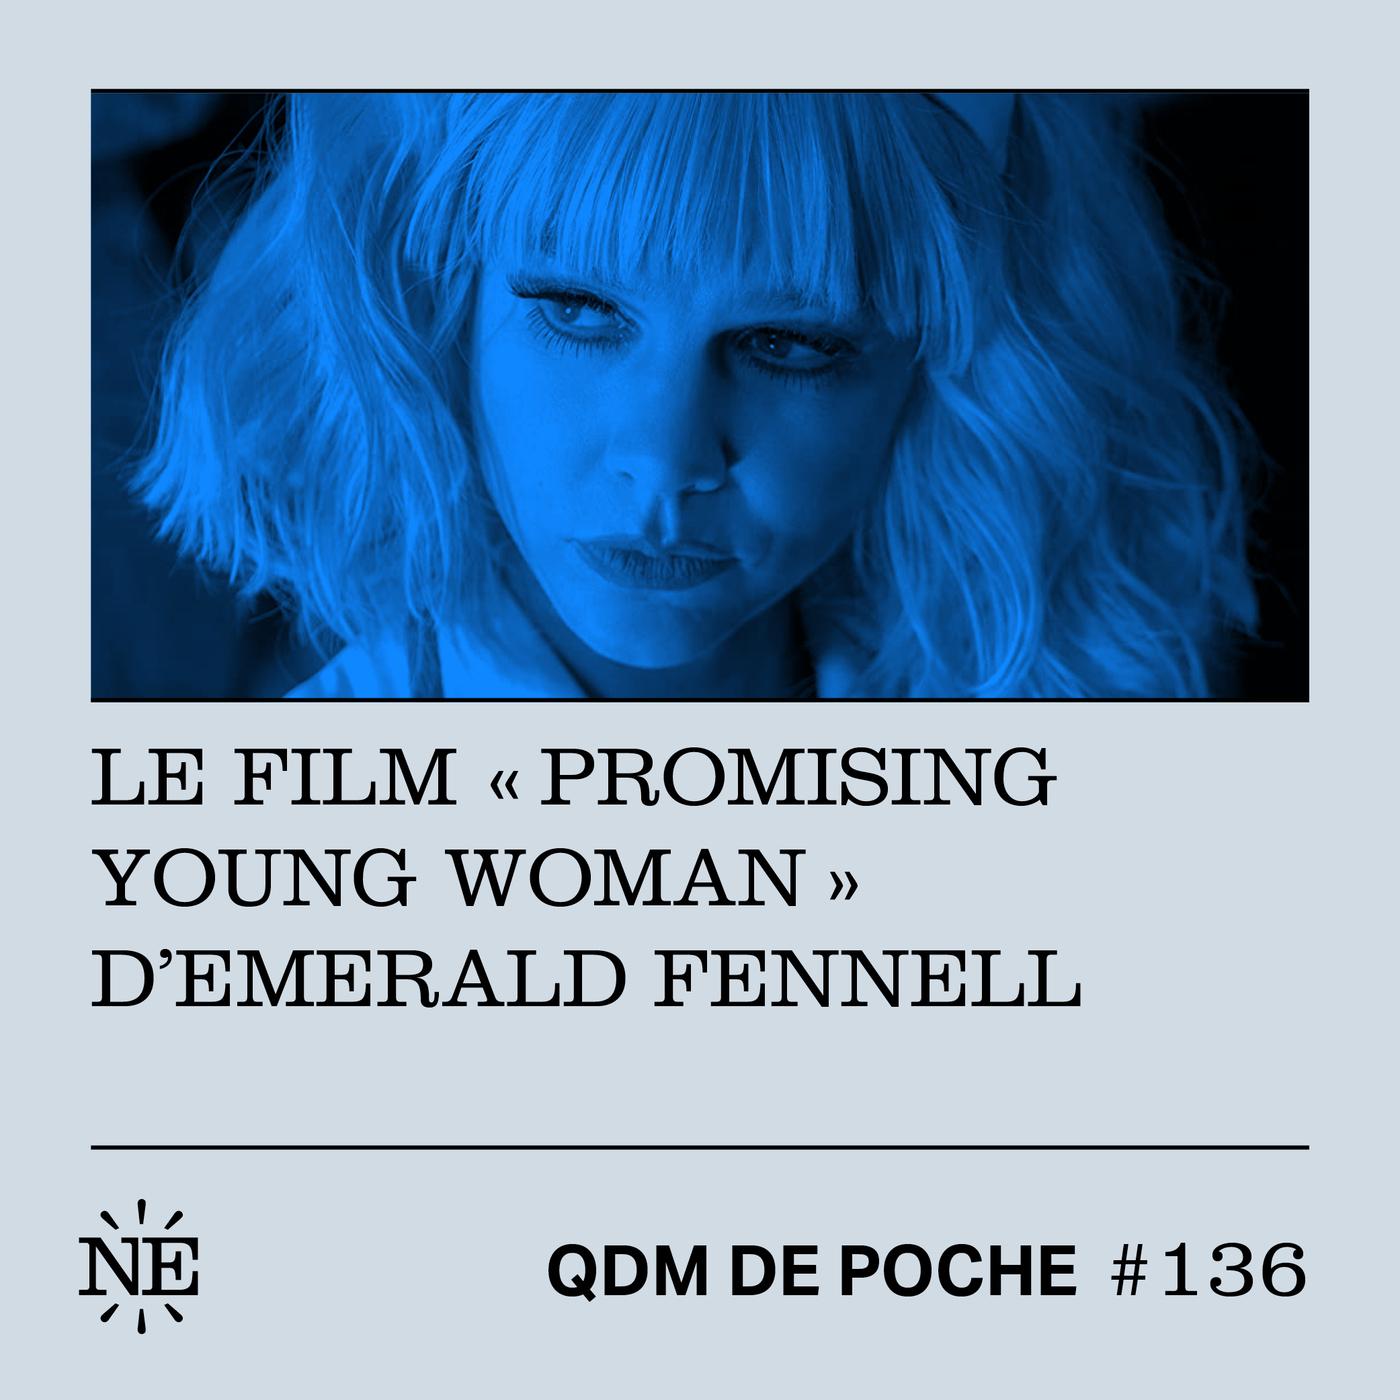 "#136 - QDM de Poche - Le film ""Promising Young Woman"" d'Emerald Fennell"